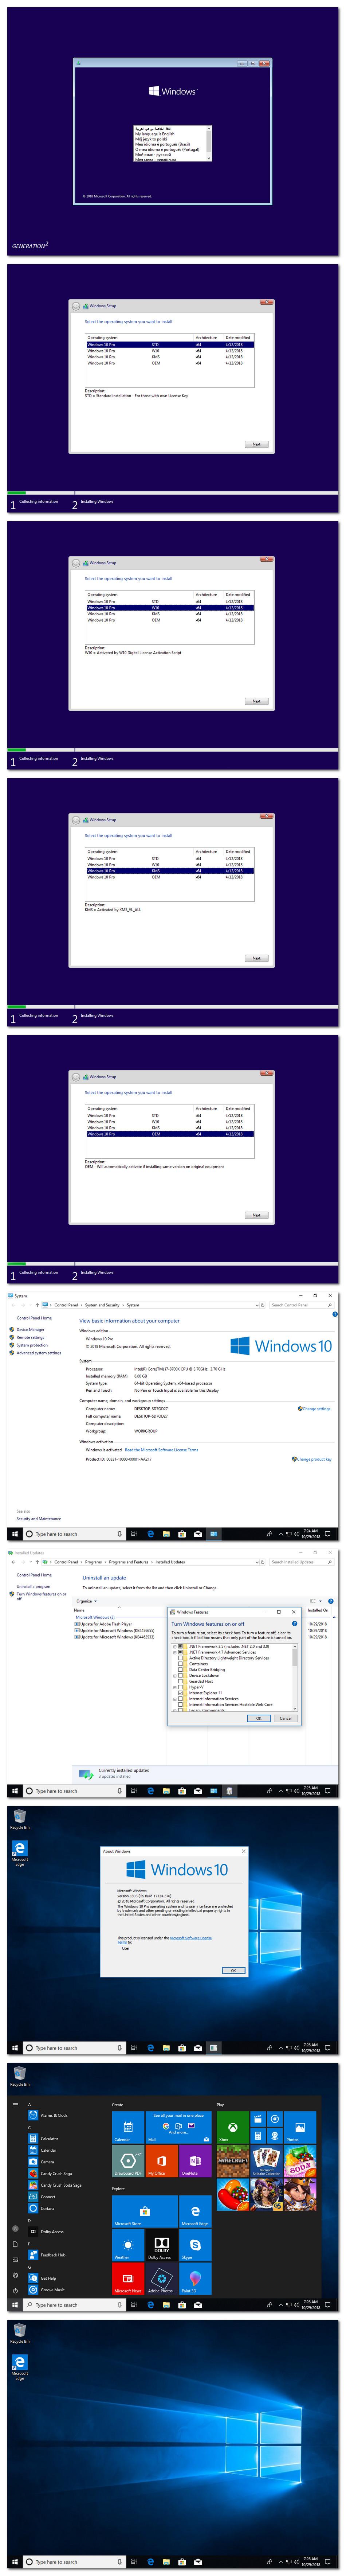 windows 10 generation 2